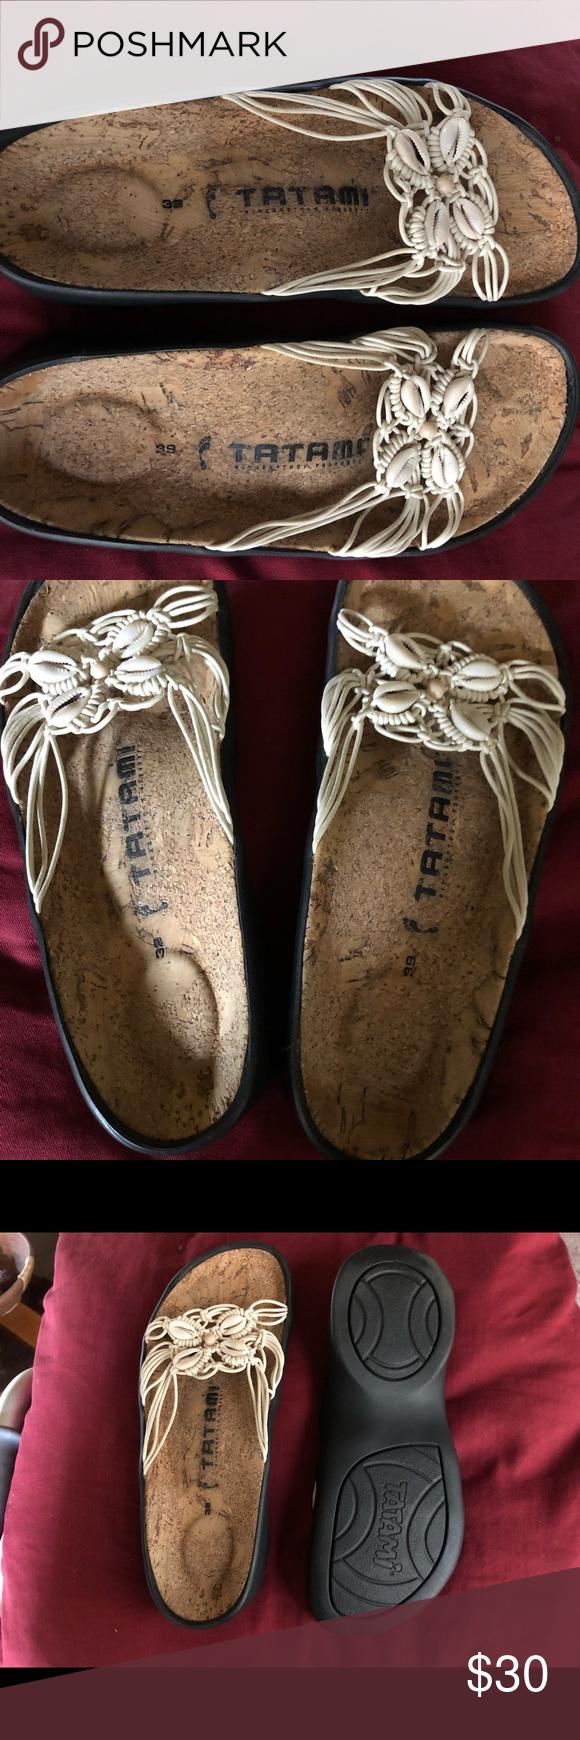 Strap sandals, Birkenstock, Pointed heels